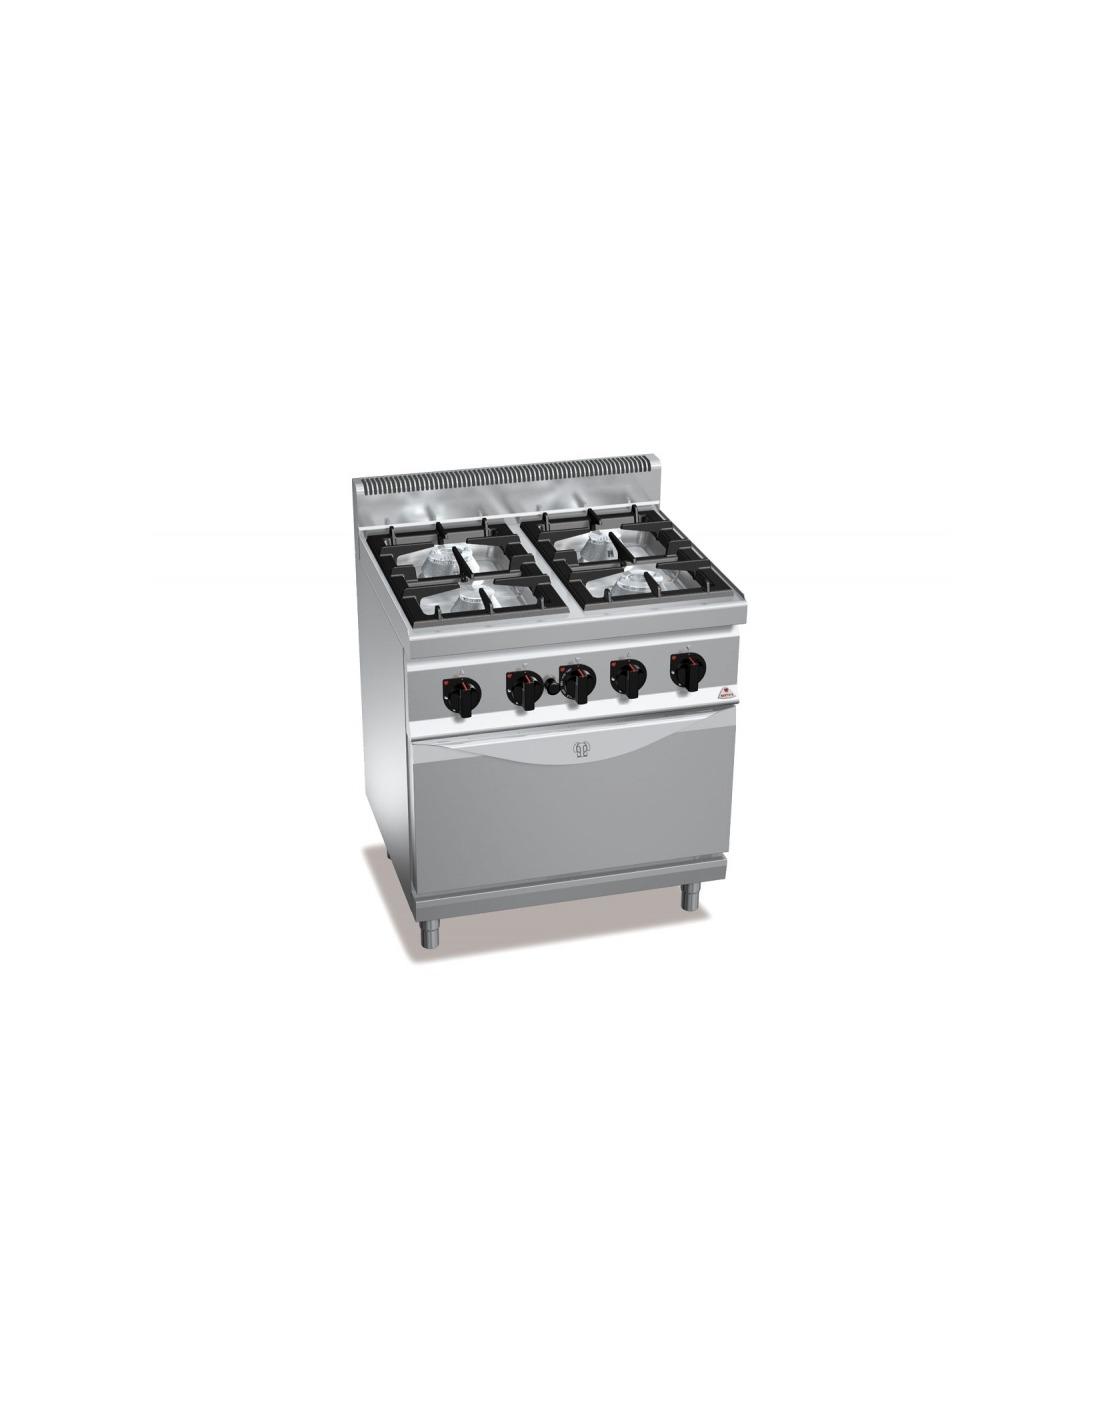 cocina 4 fuegos a gas con horno convecci n